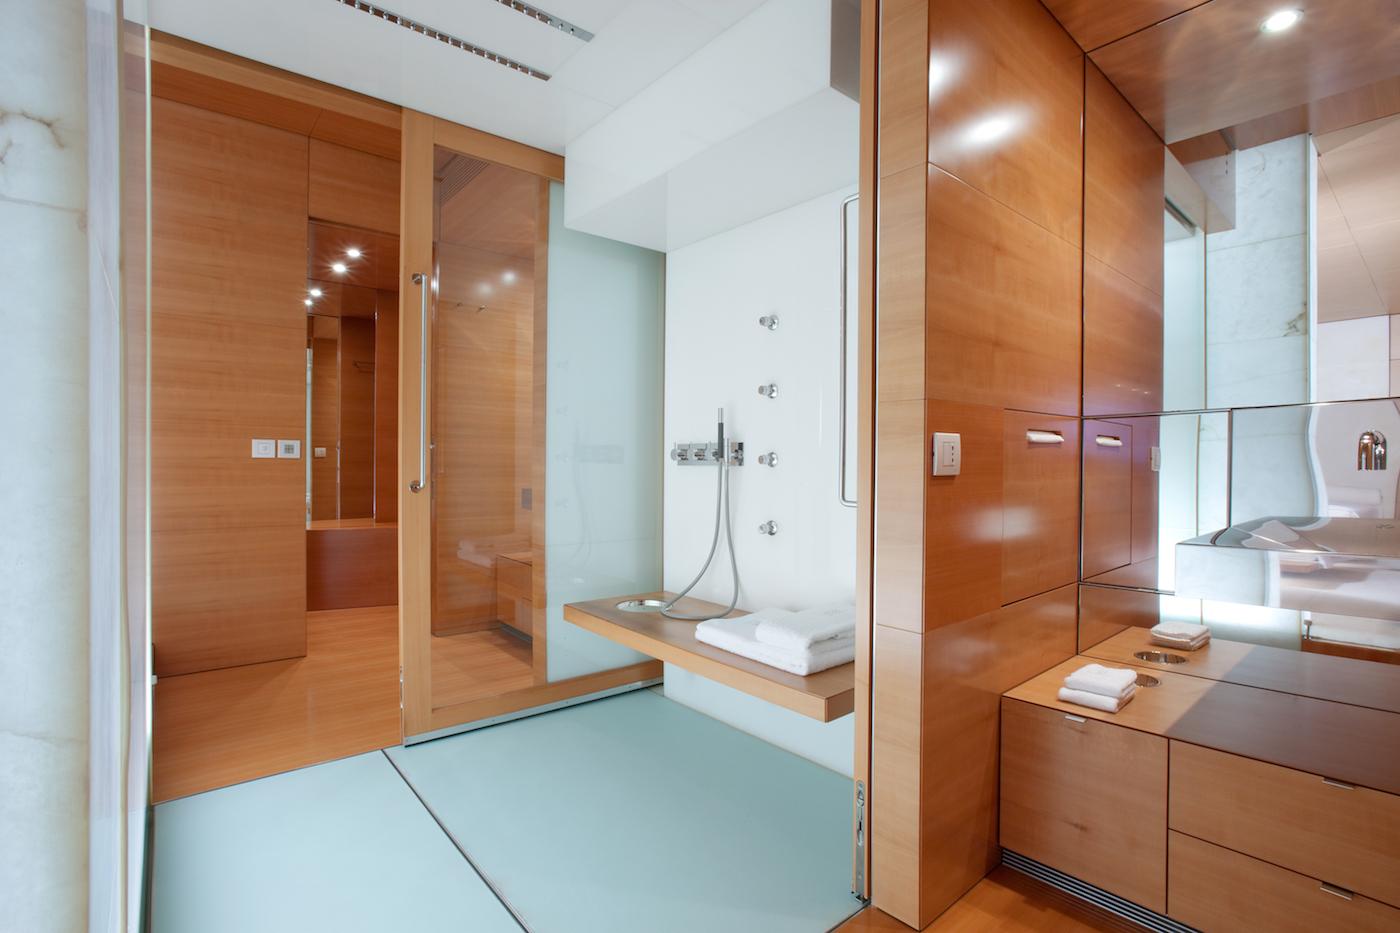 BM Master Cabin Bathroom